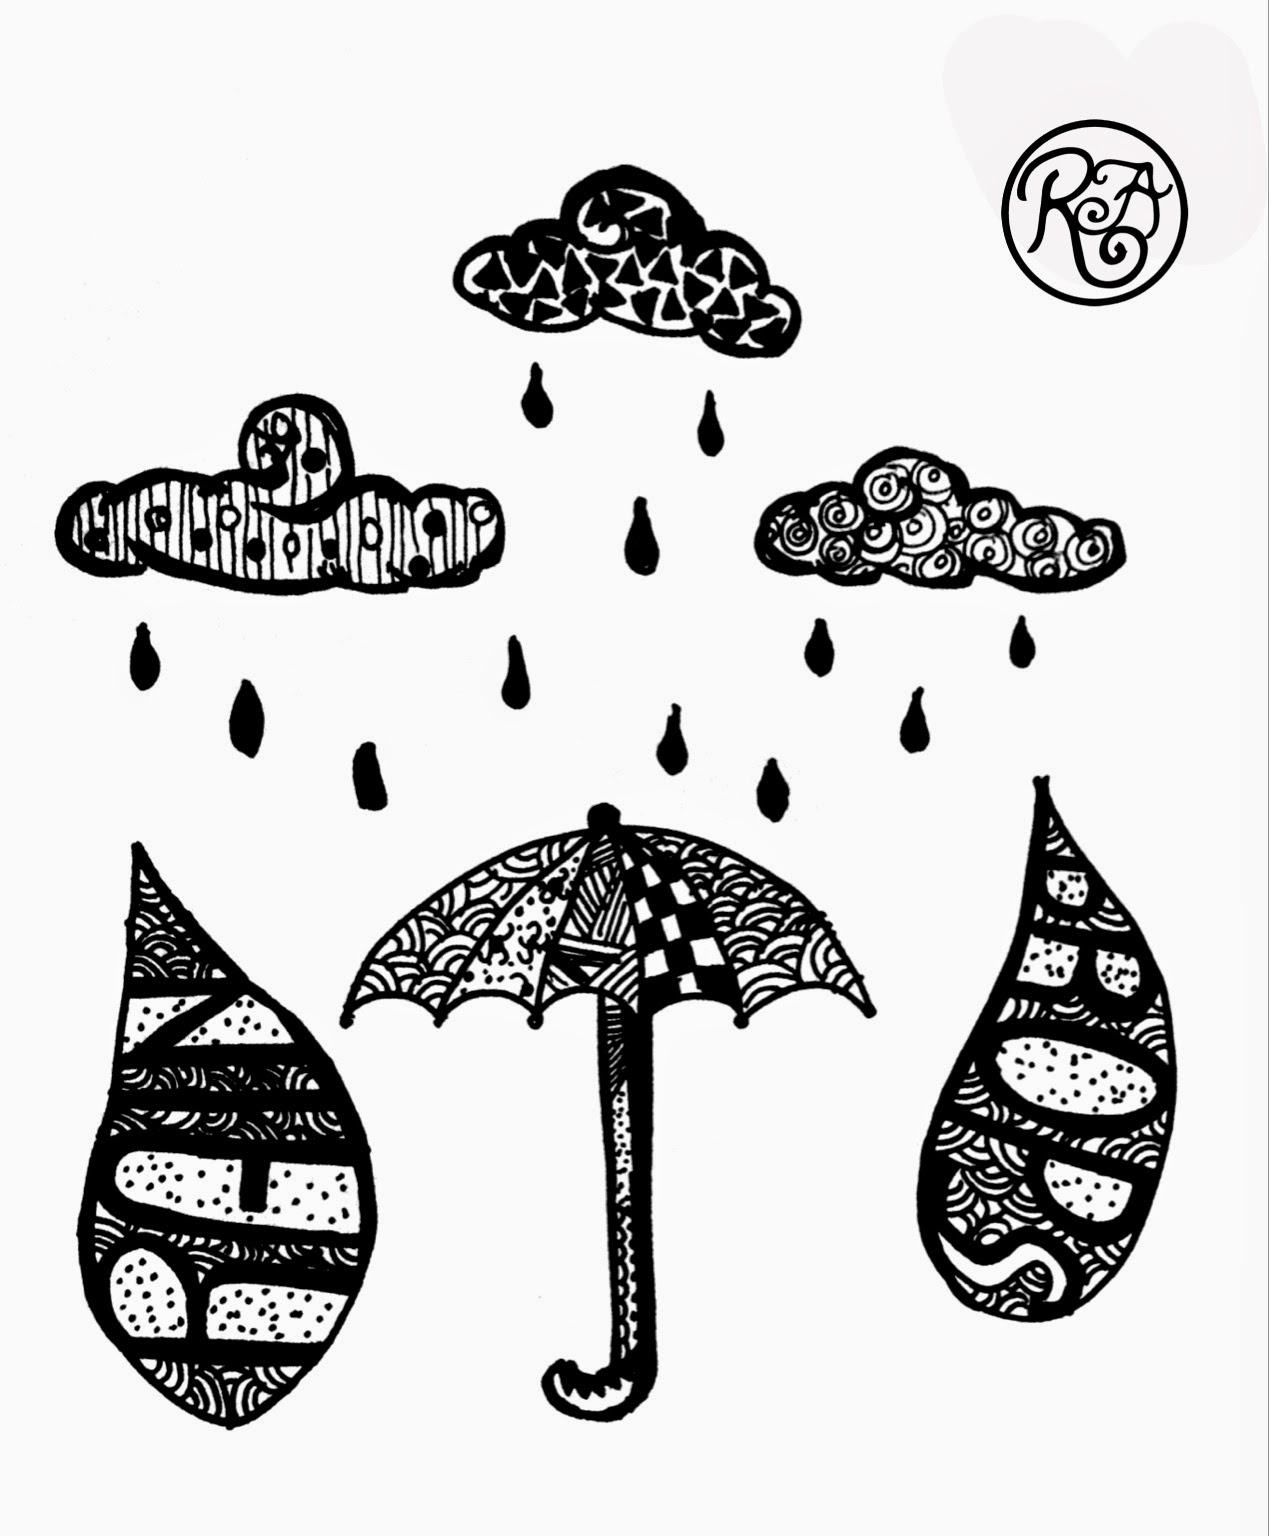 Art-Core: Raindrops doodle